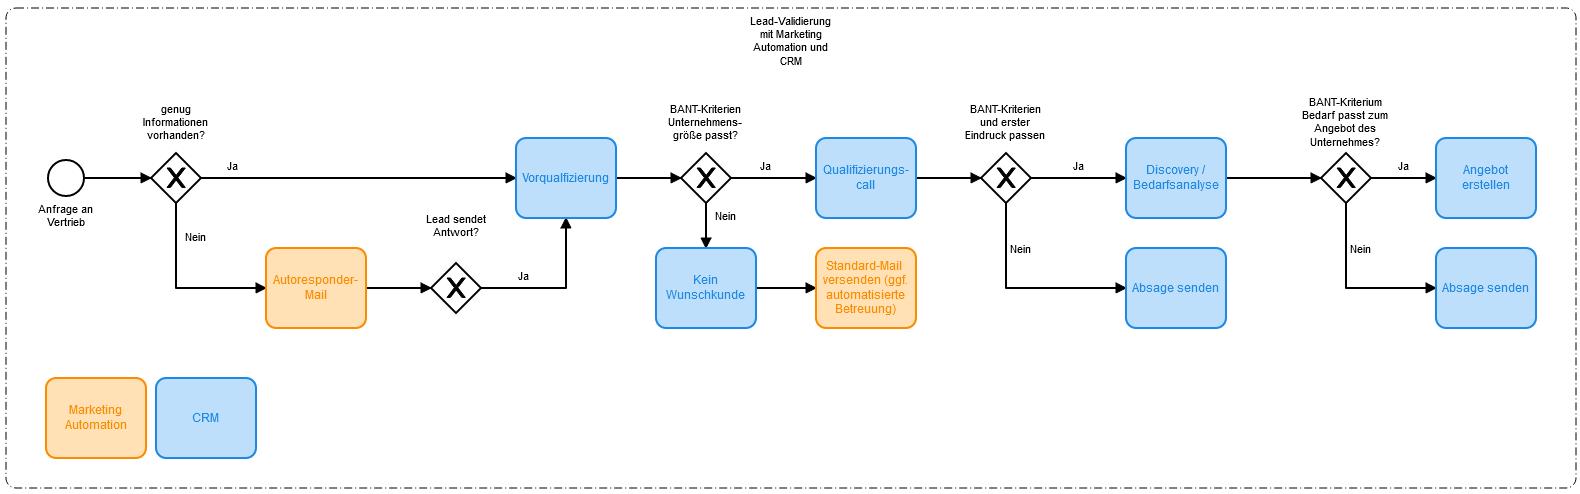 Lead-Validierung